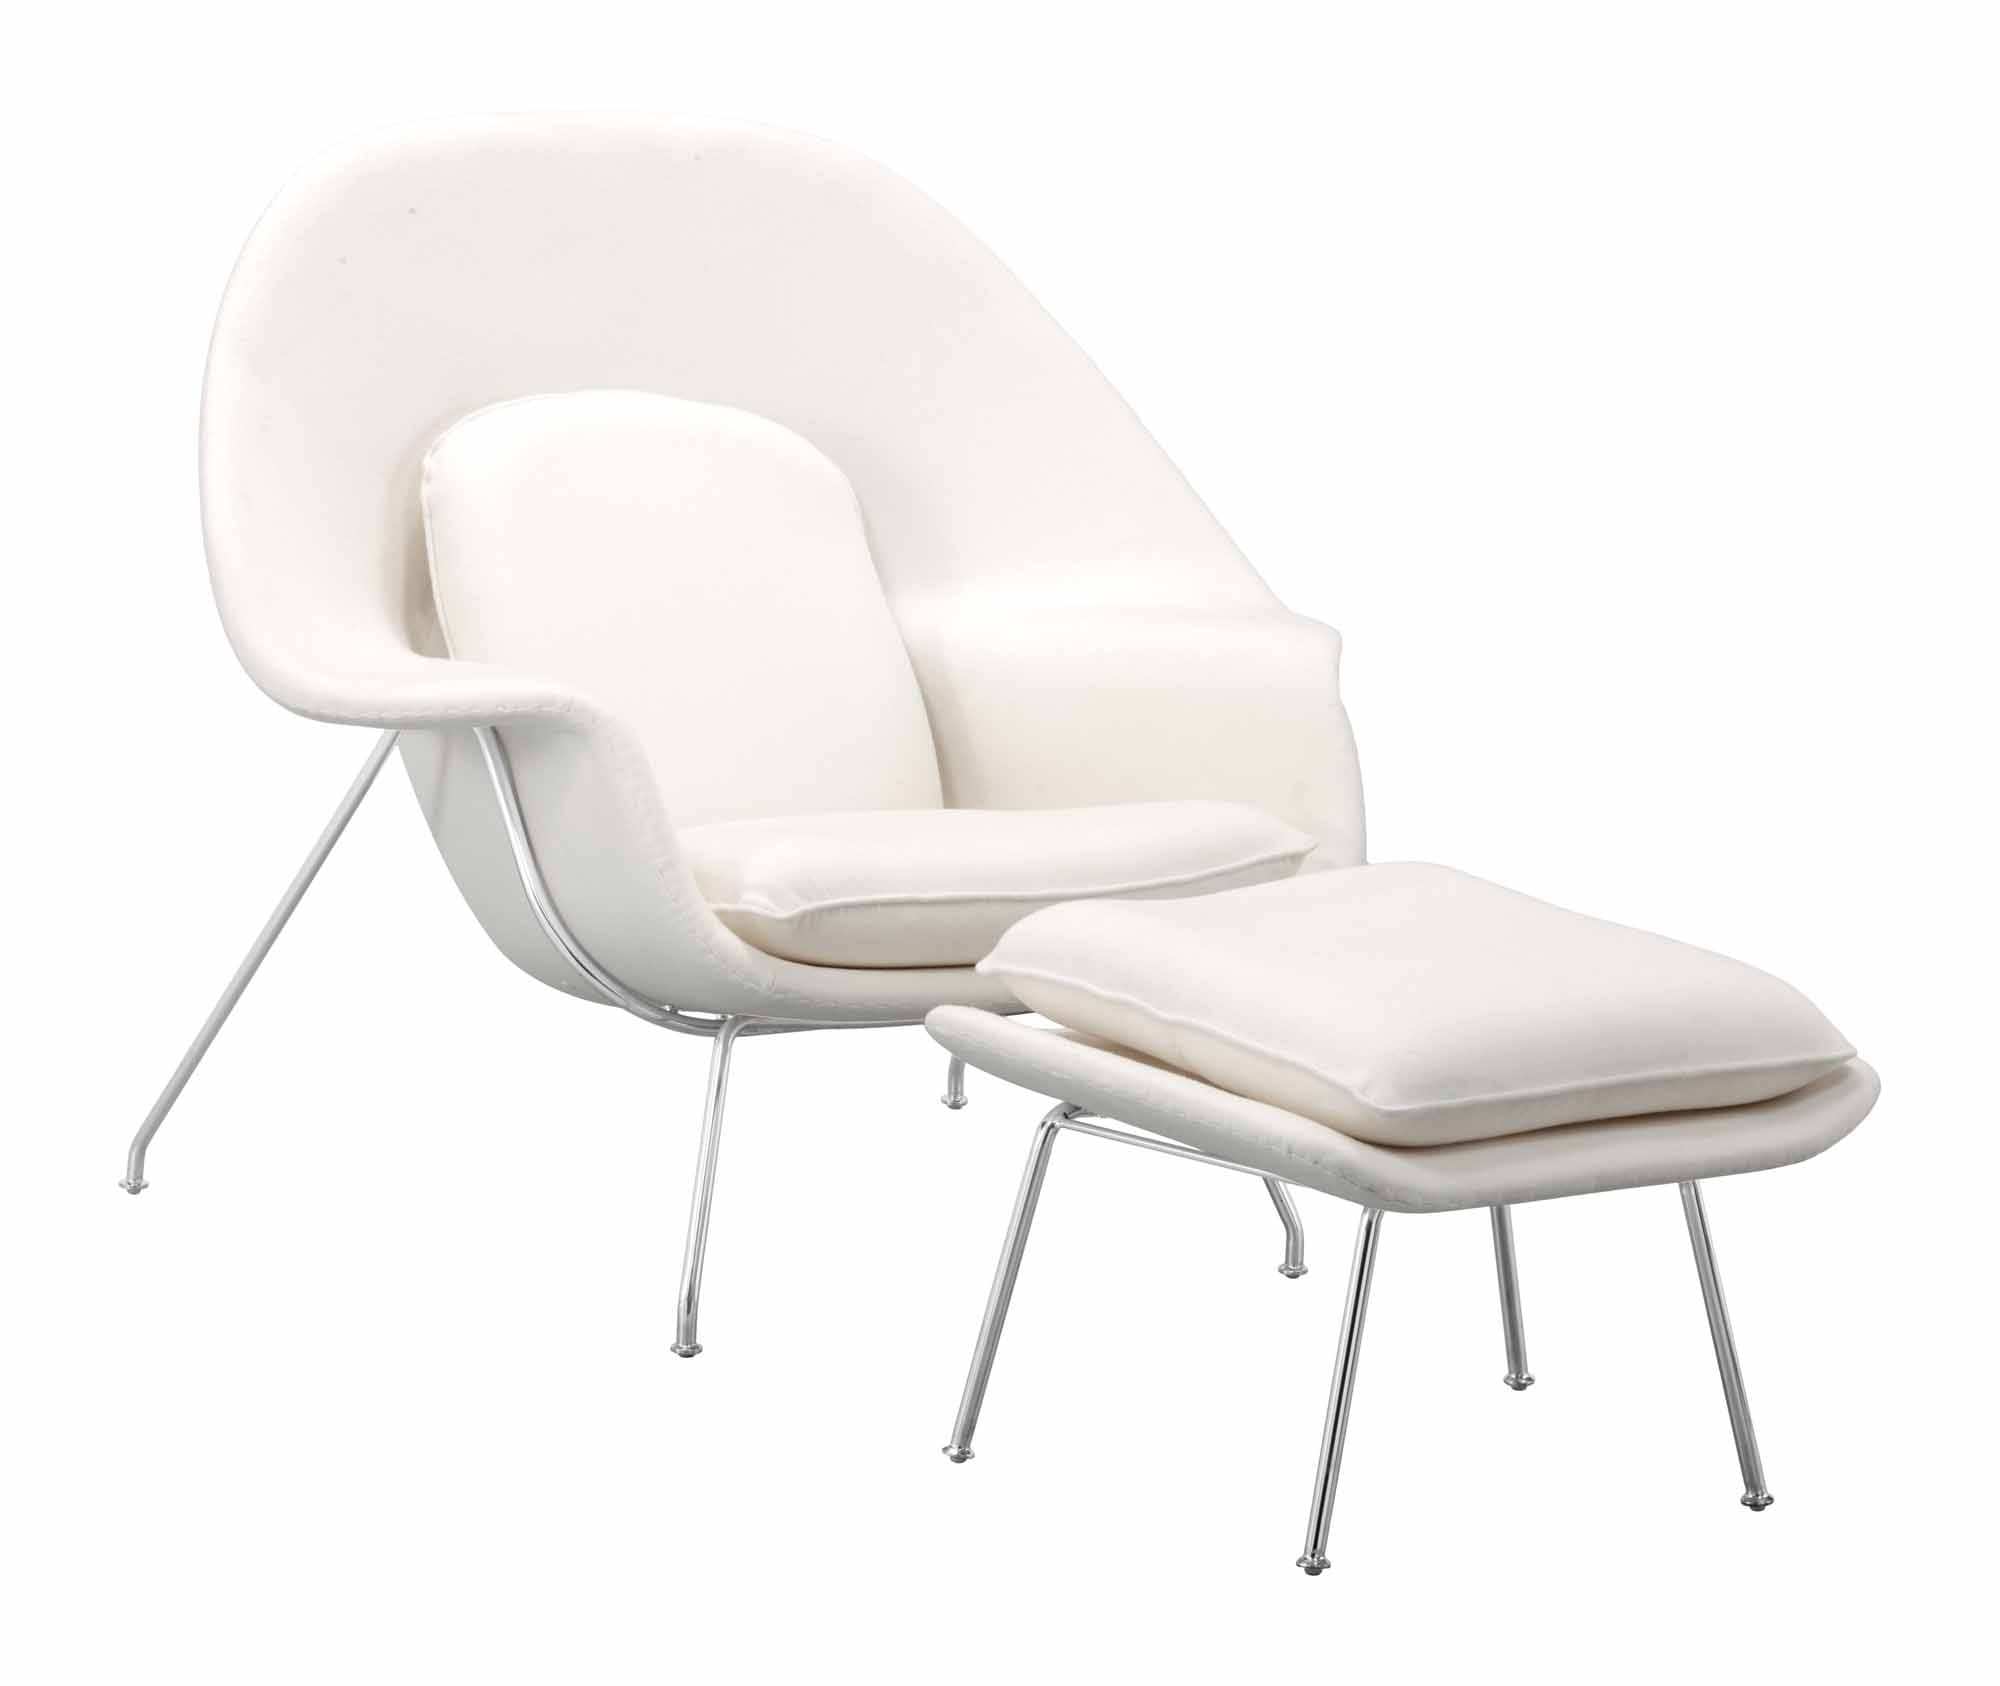 Nursery Chair And Ottoman White By Zuo Modern (Zuo Modern)